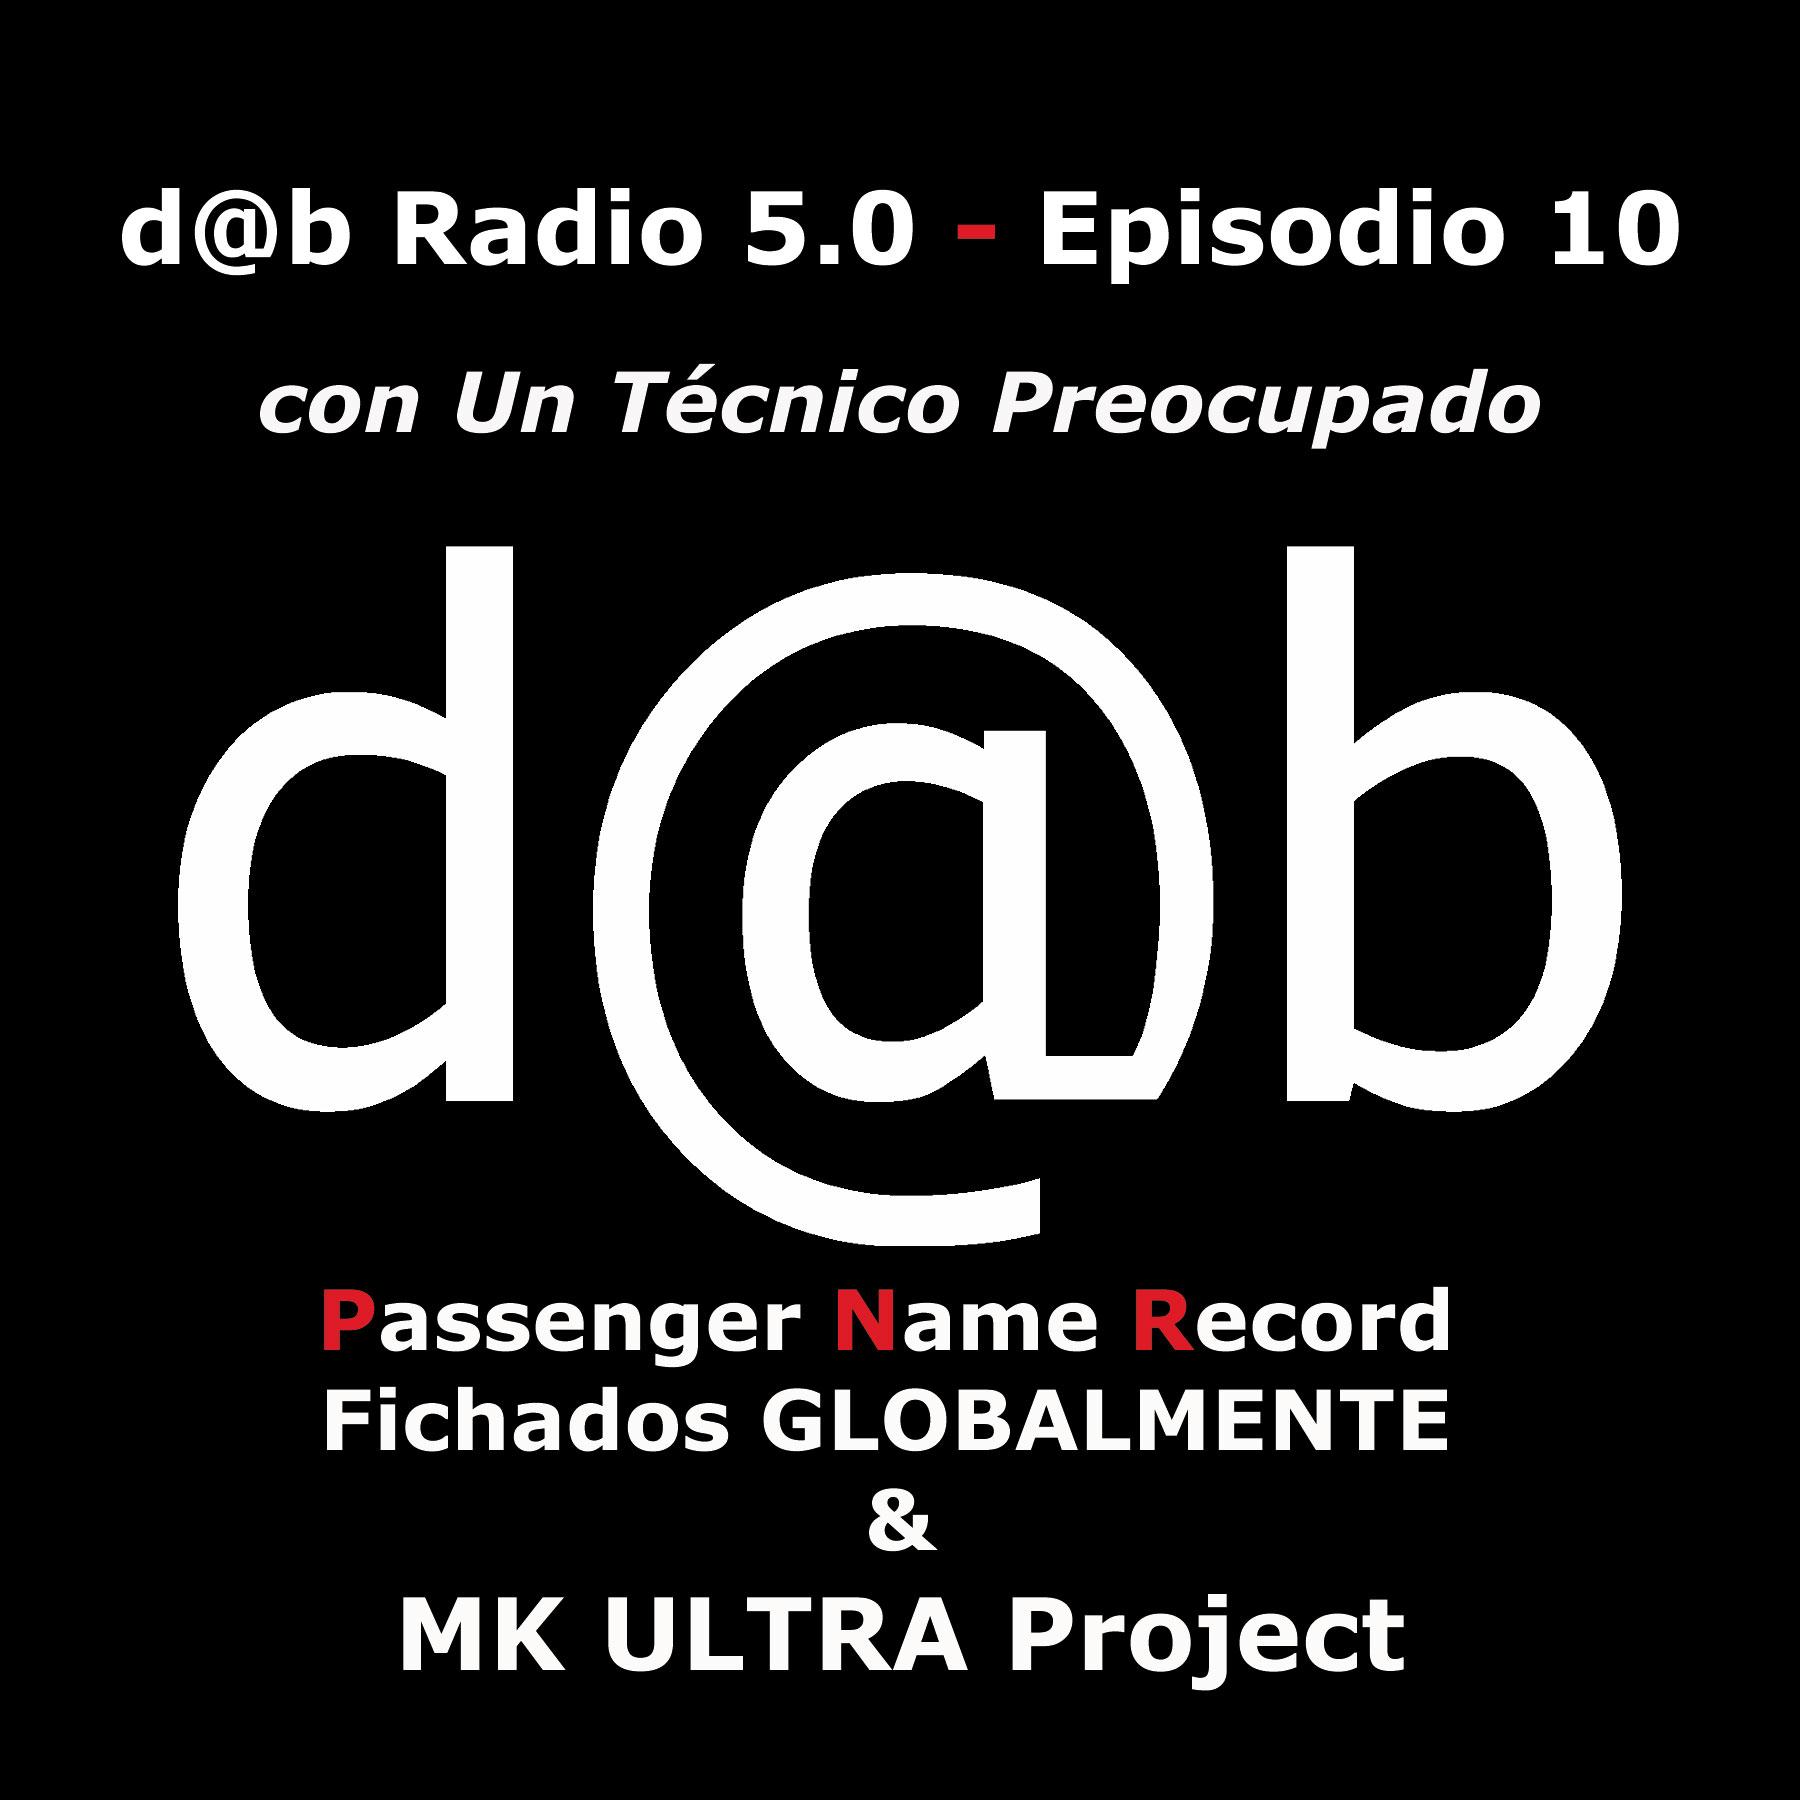 Desmontando a Babylon: Dab  Radio  5.0  Episodio  10  con  Técnico  Preocupado,  Passenger  Name  Report  y  MK-Ultra